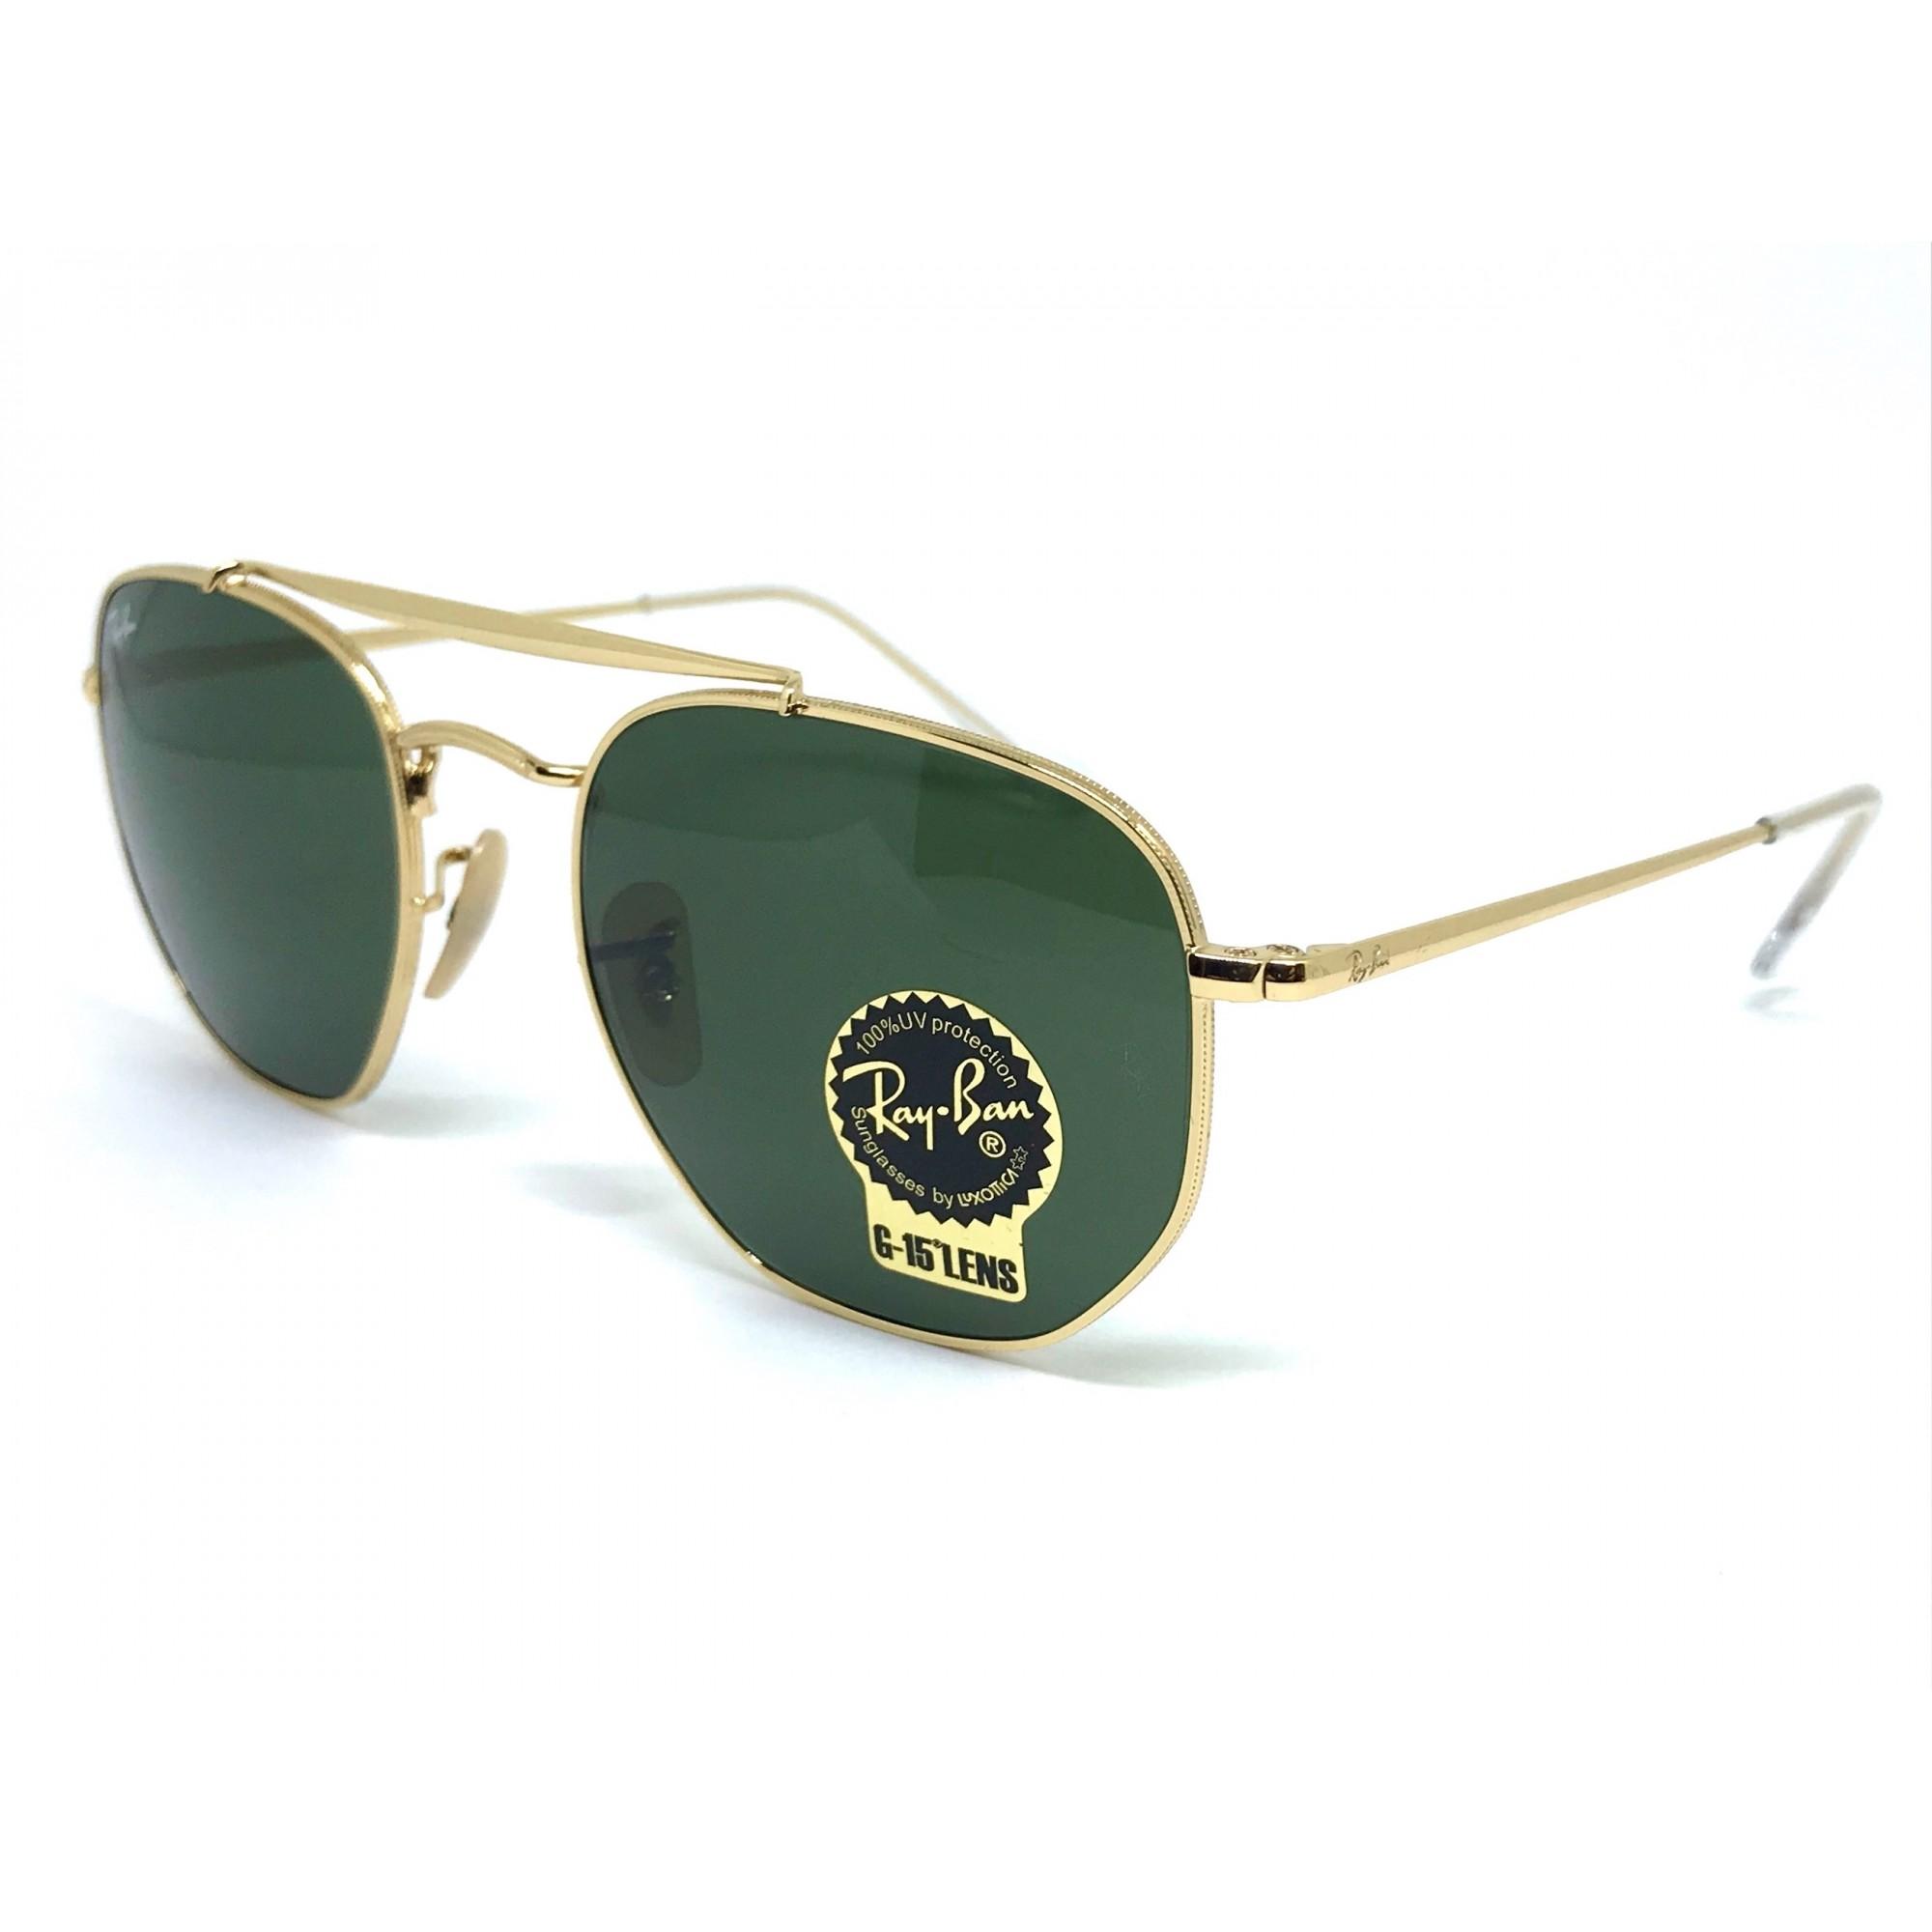 b030c21fbf4a2 ... Oculos de sol RAY BAN Marshal RB3648 001 54